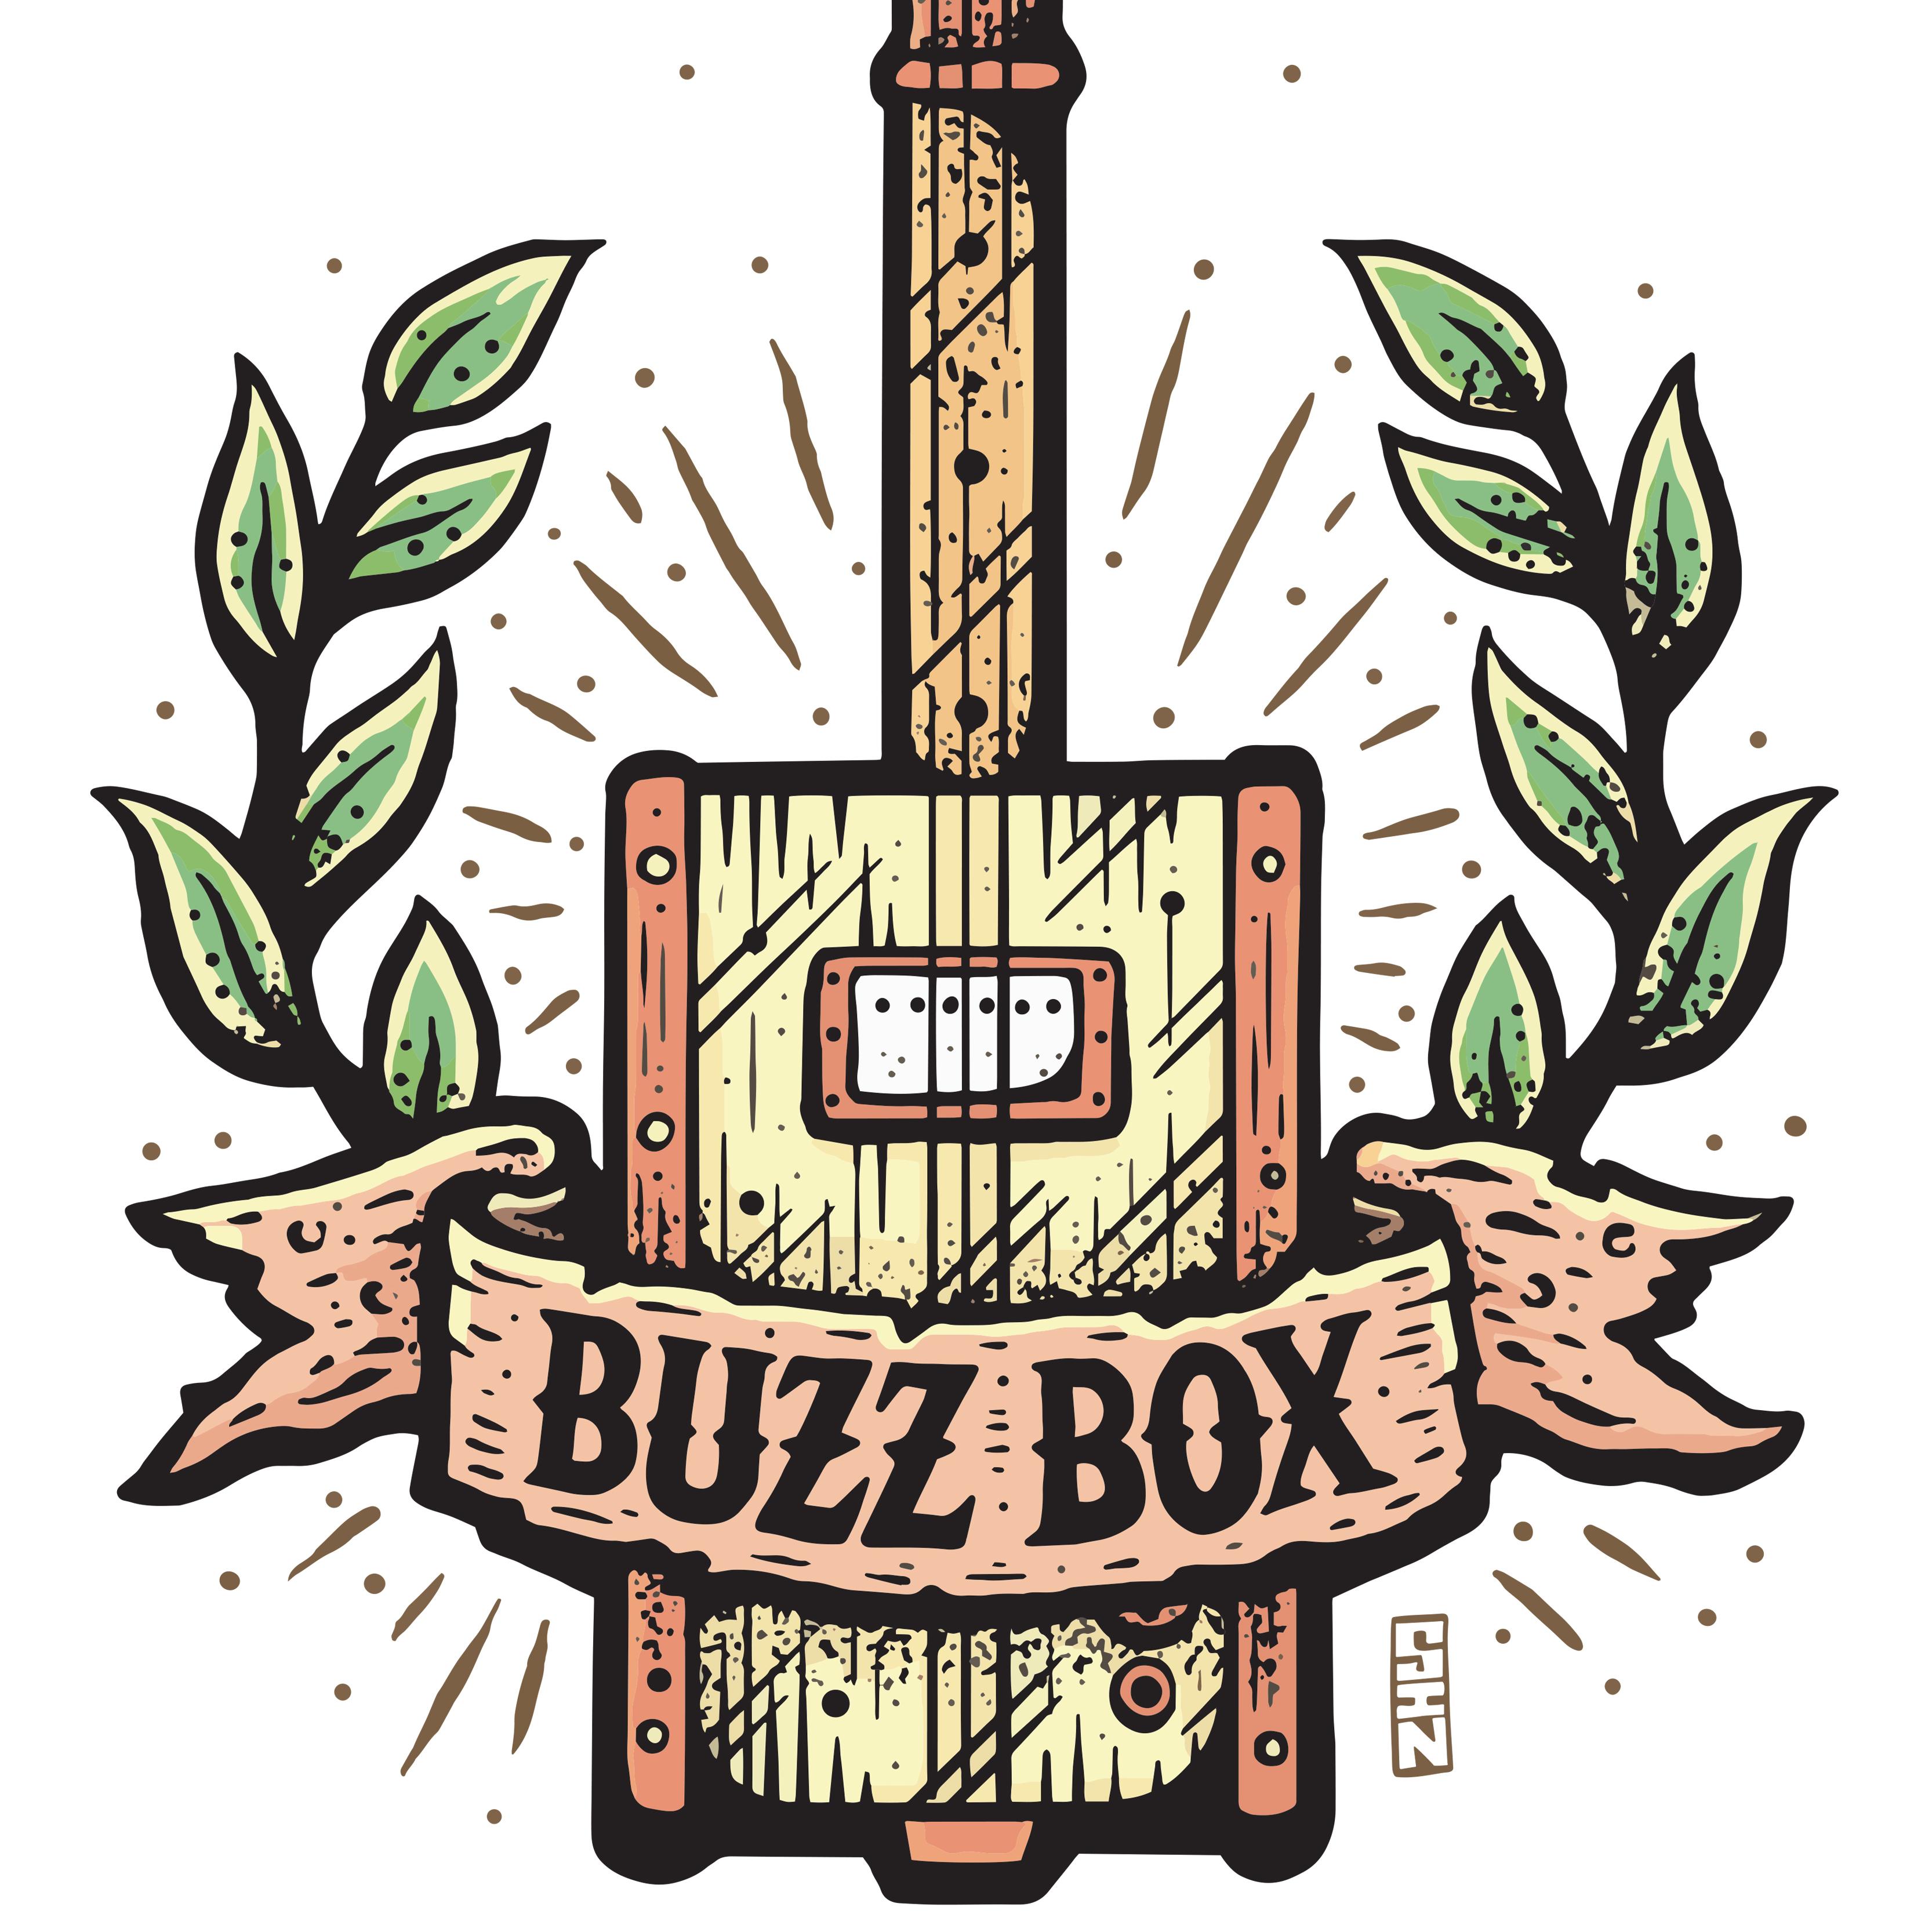 Buzz Box Guitars